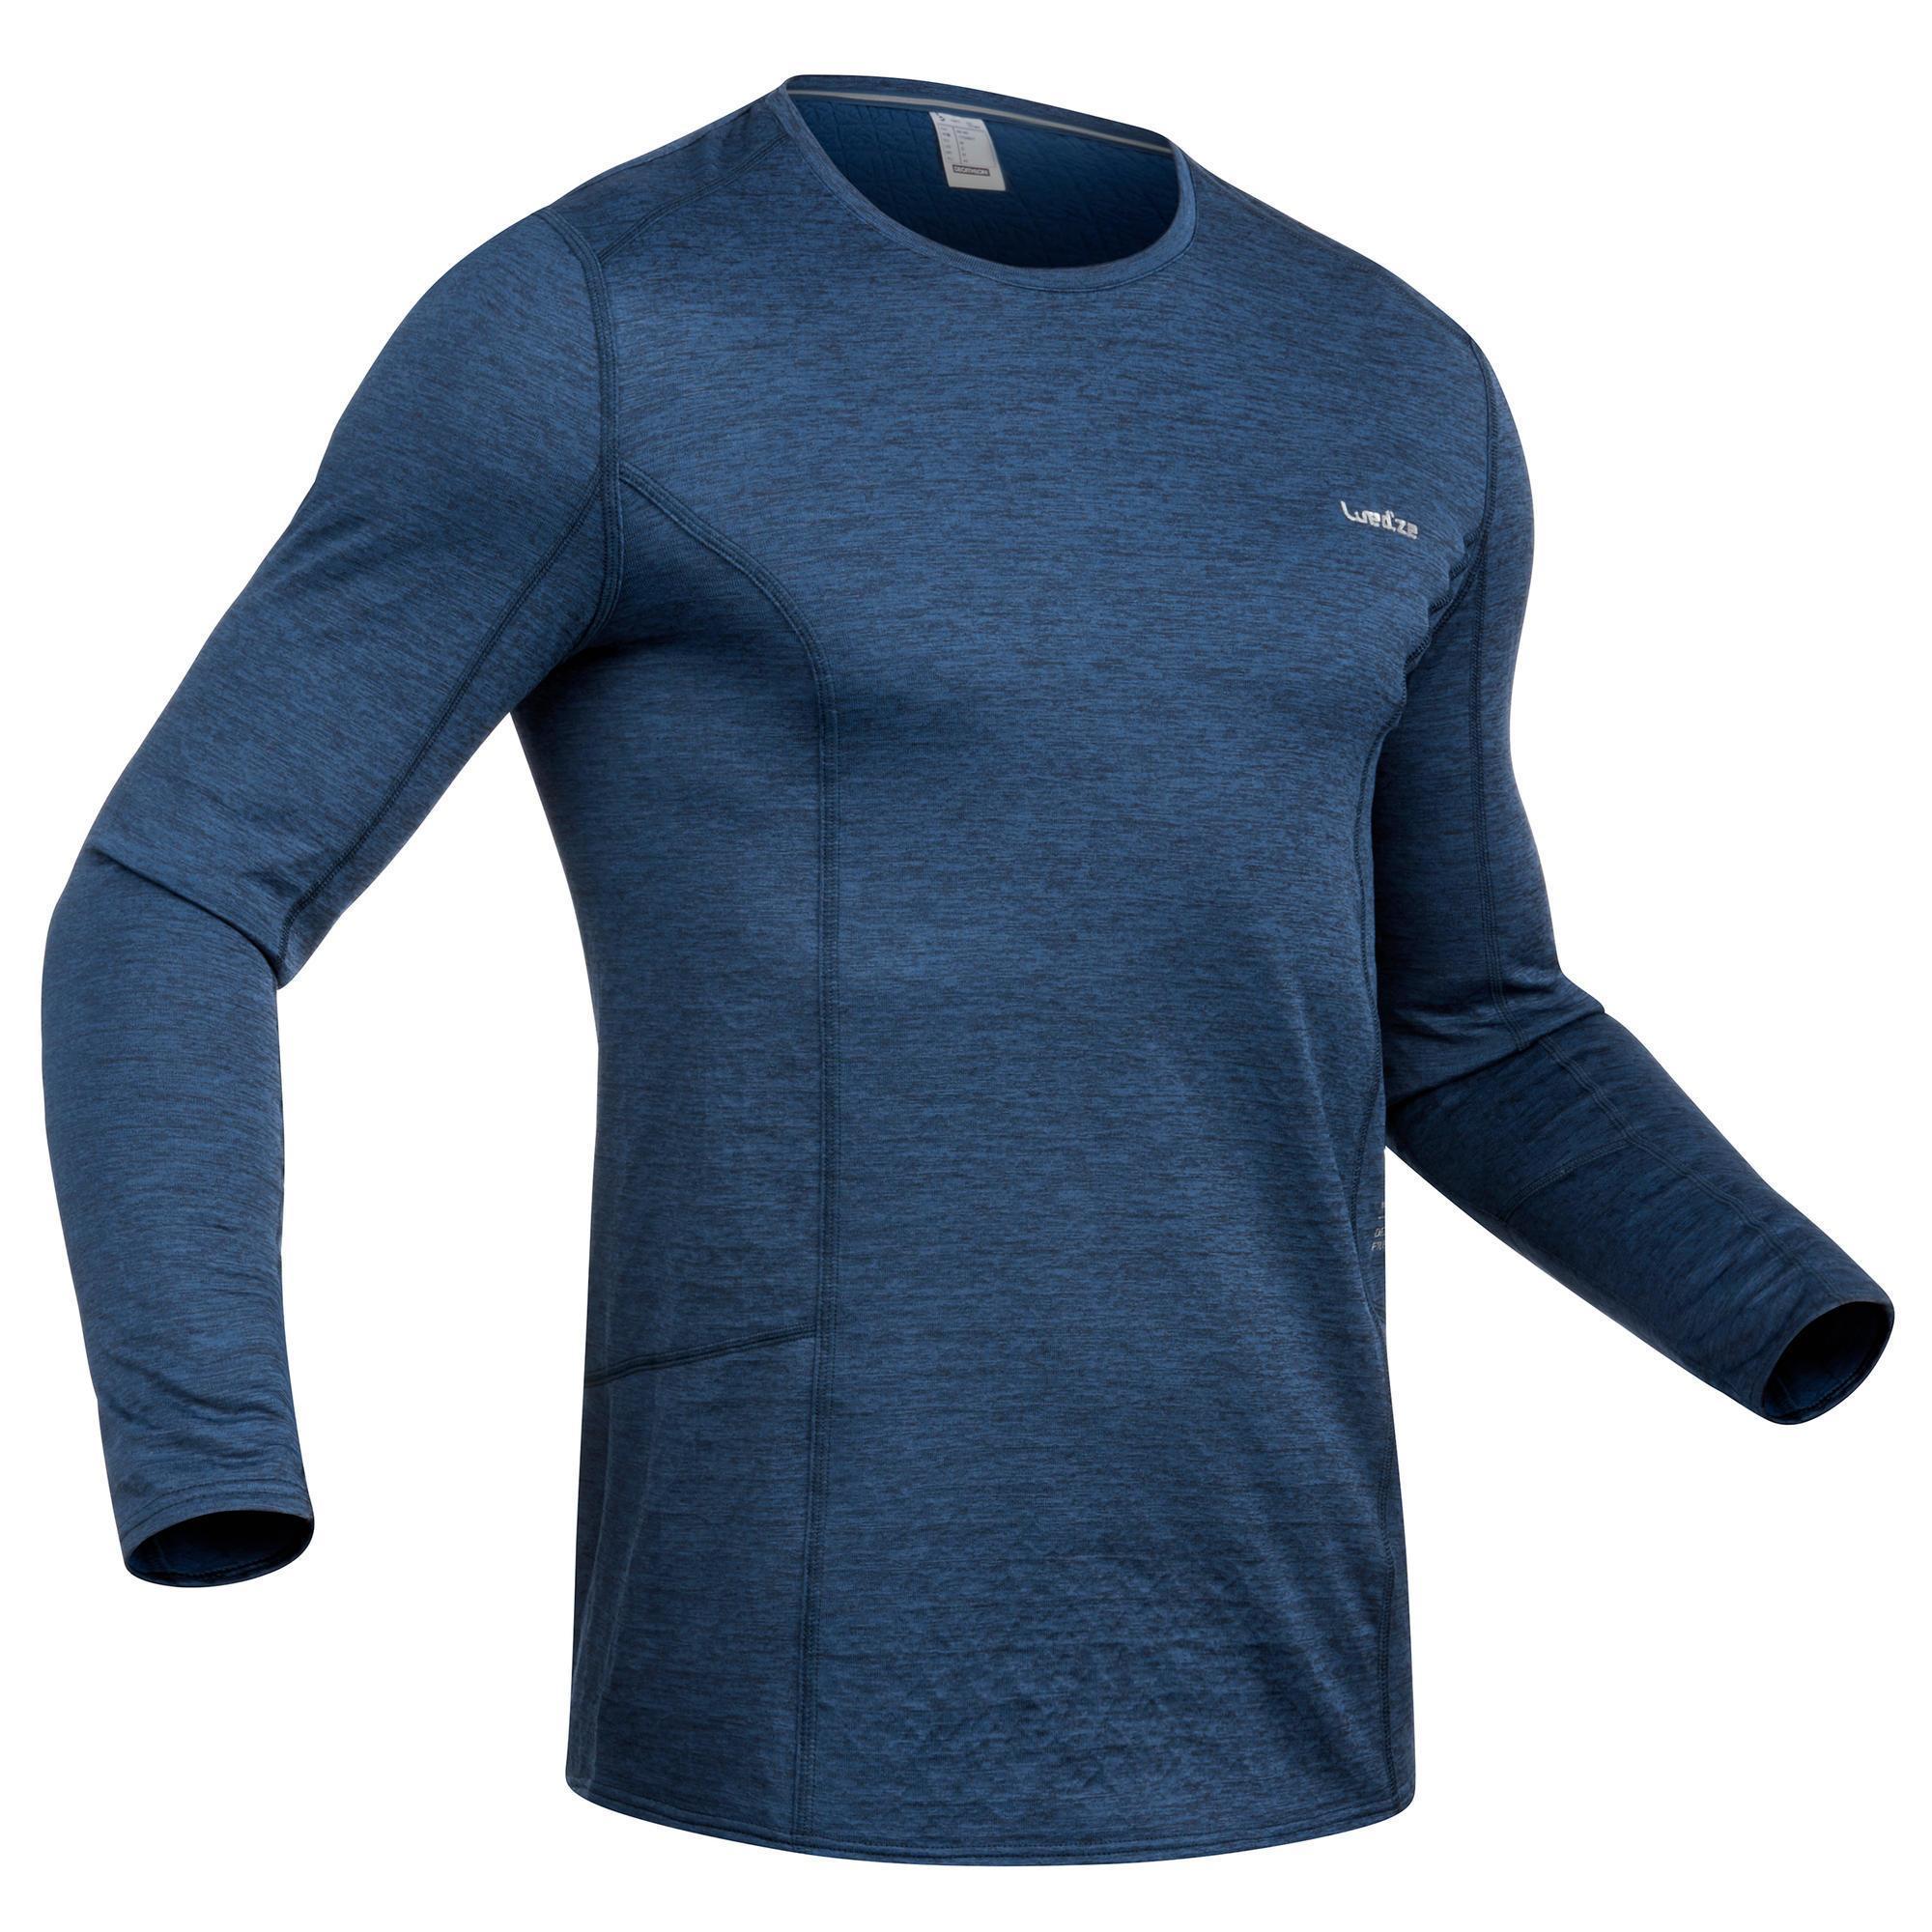 Camiseta térmica para hombre WEDZE